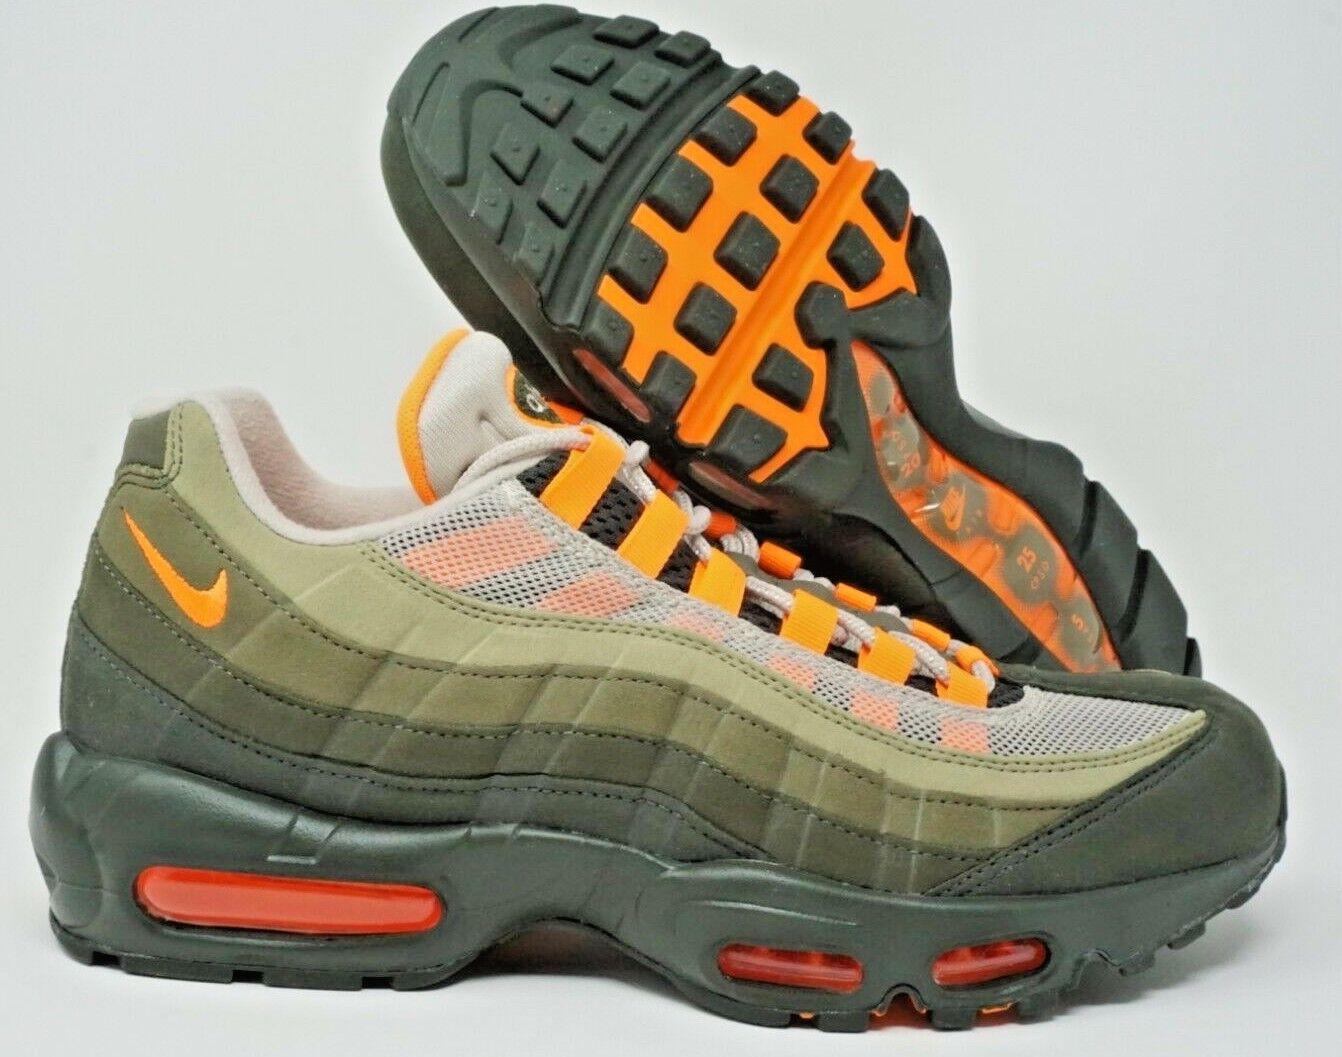 Nike Air Max 95 OG Mens Retro Running shoes String orange Size 12